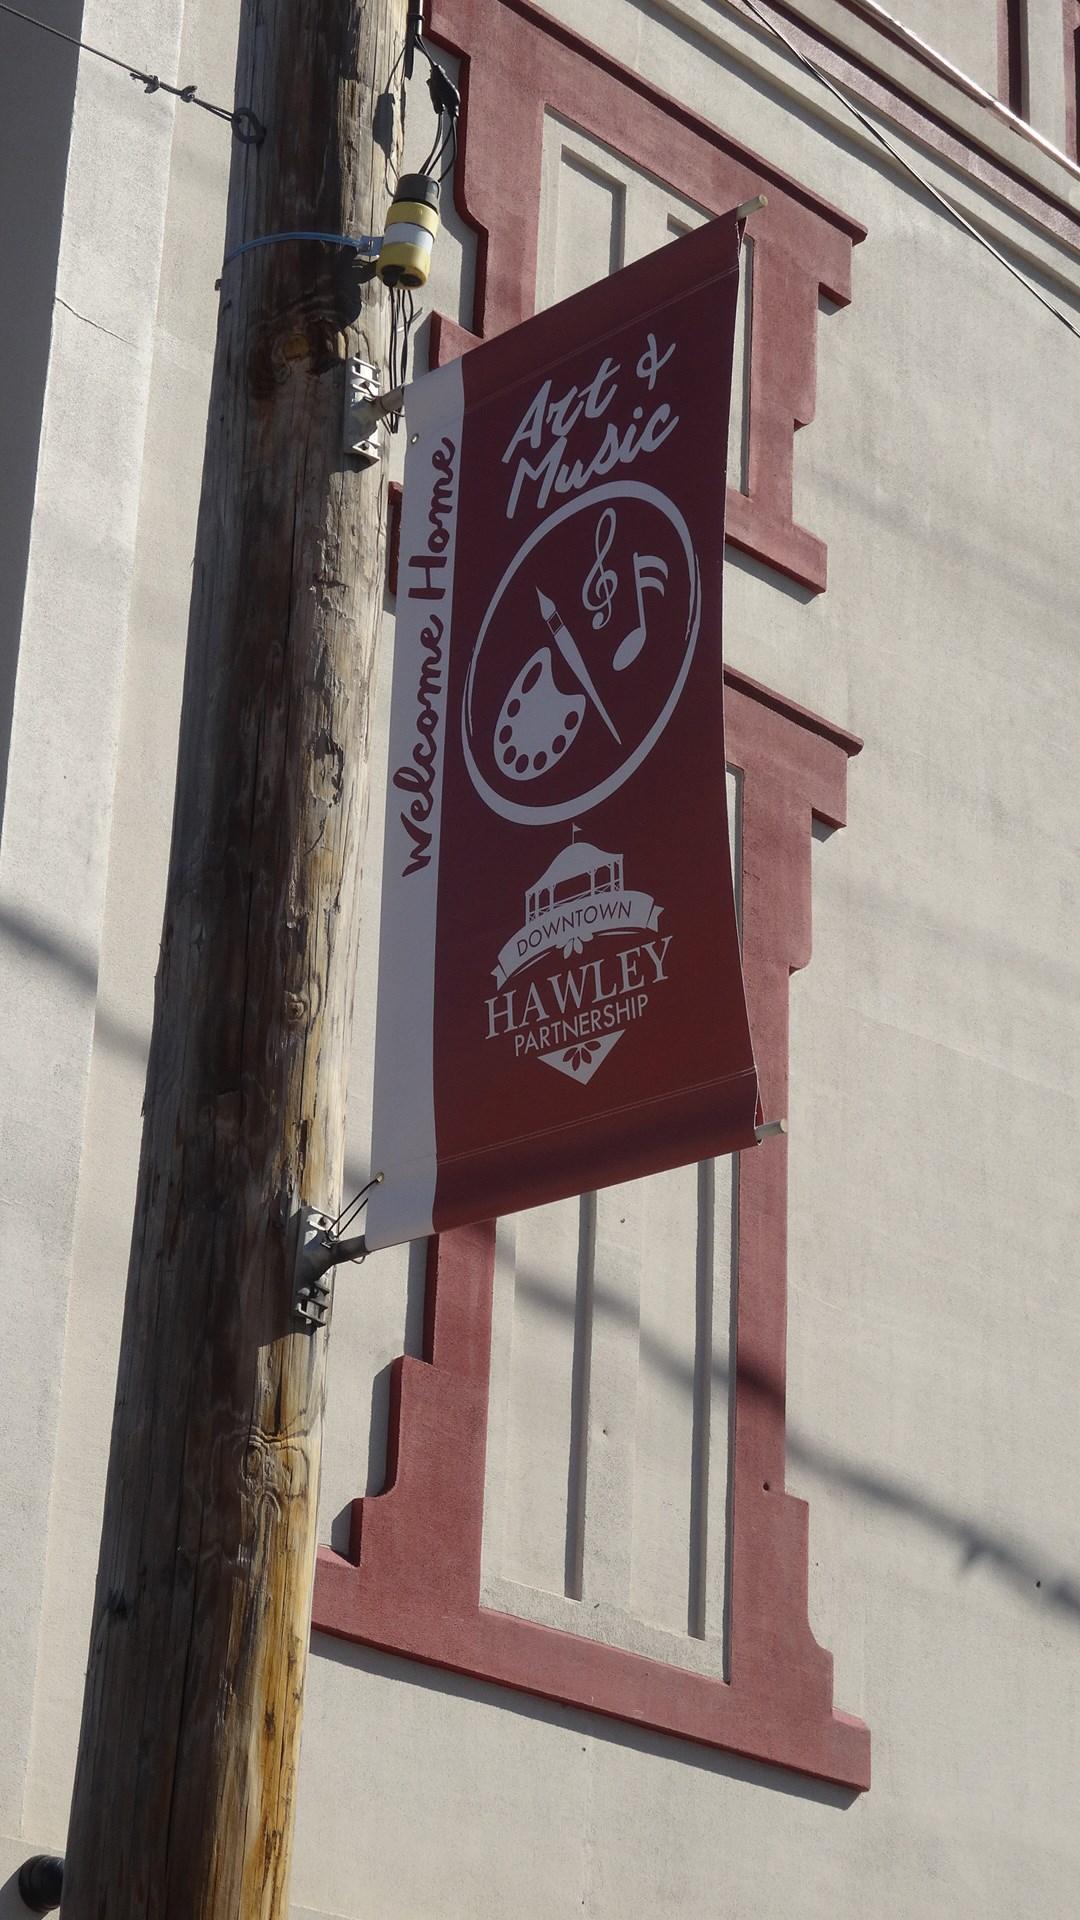 Hawley Banners